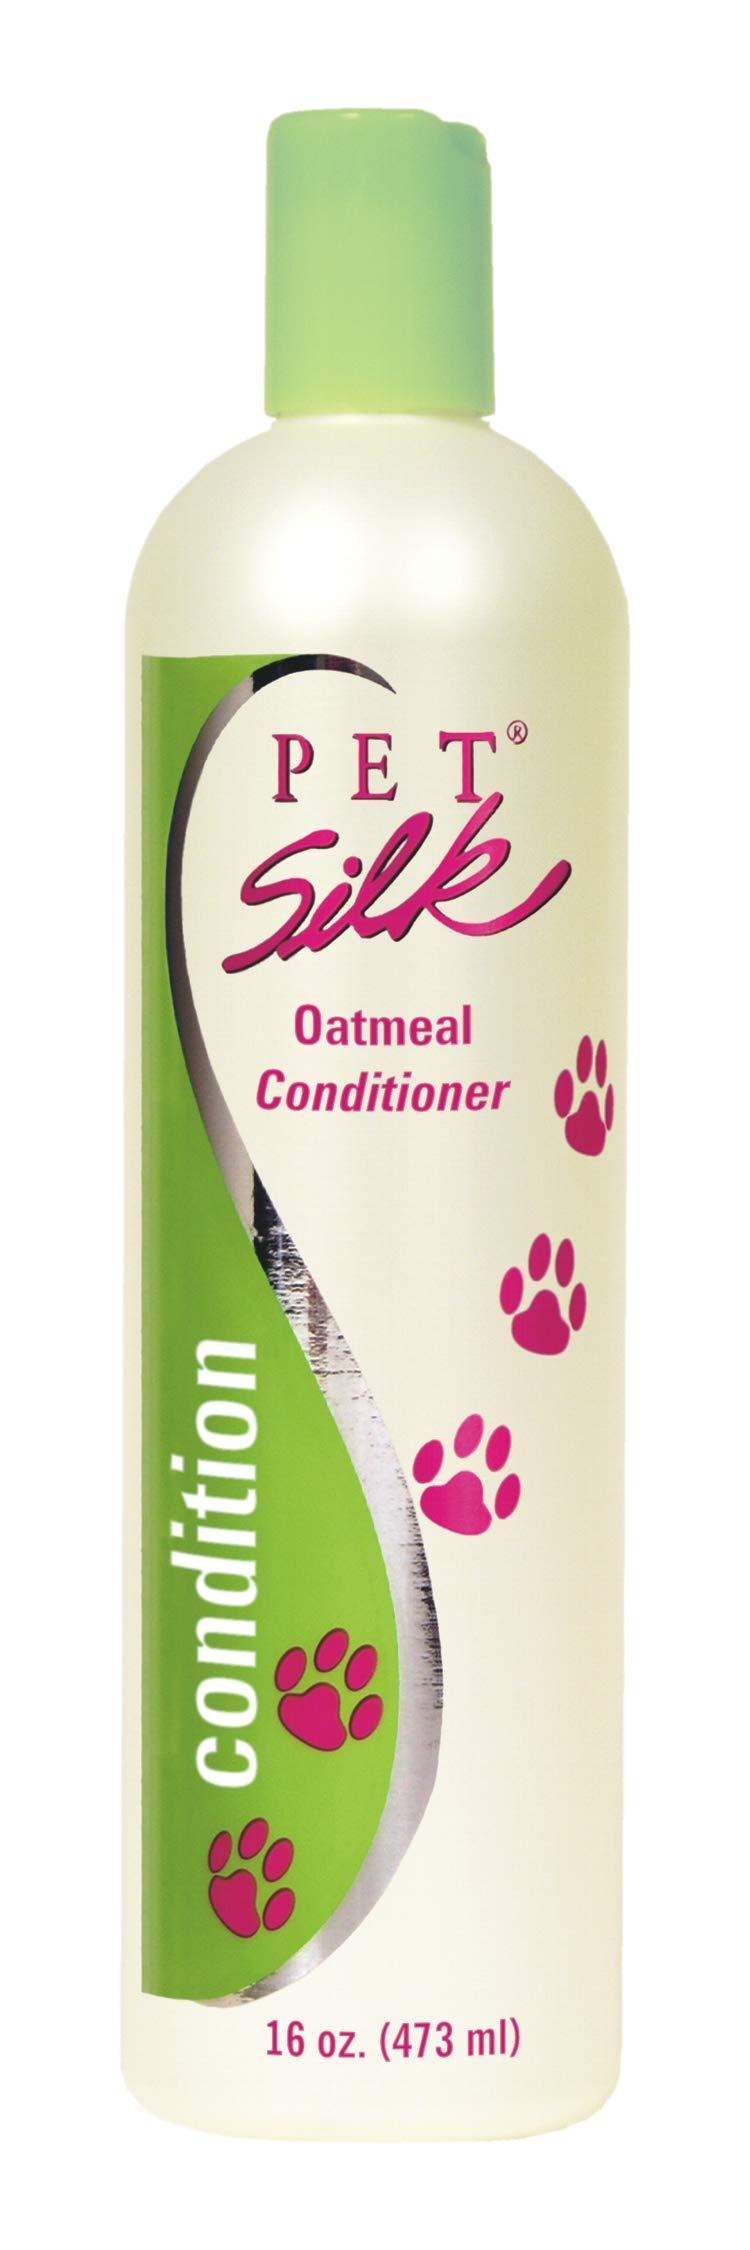 Pet Silk Pet Silk Oatmeal Conditioner 16 Oz, 16 Oz